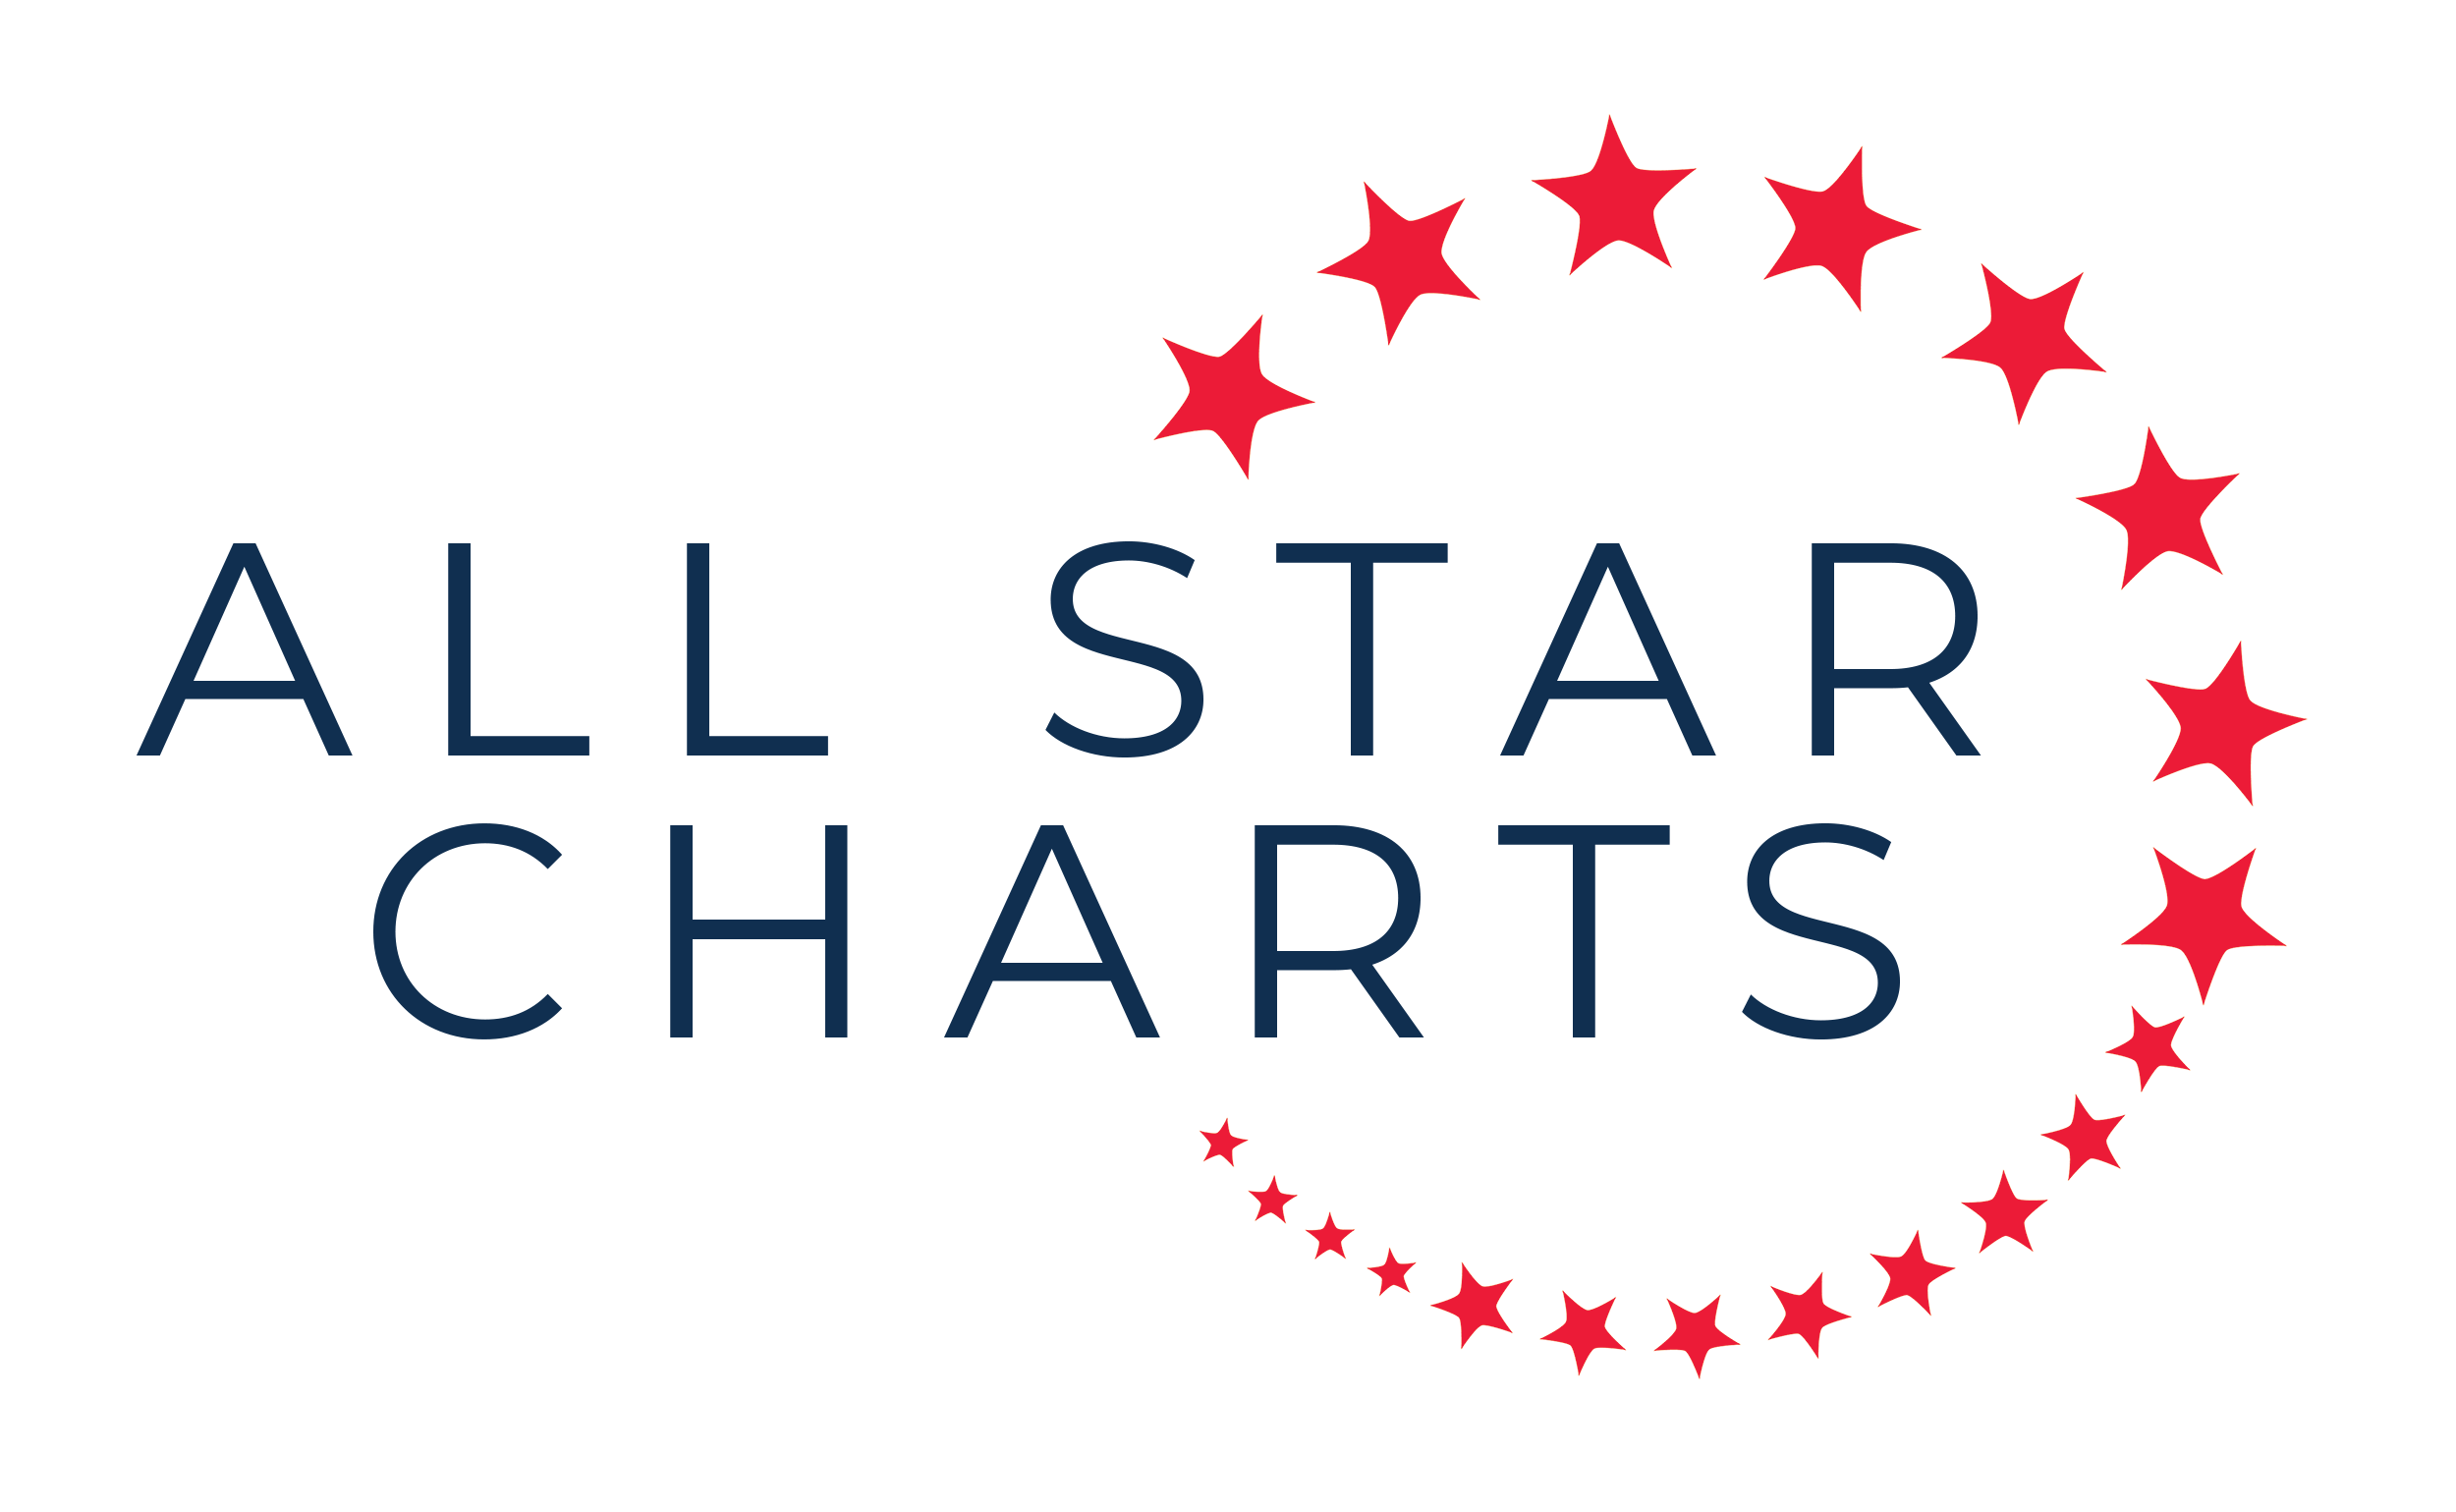 All Star Charts Free Membership